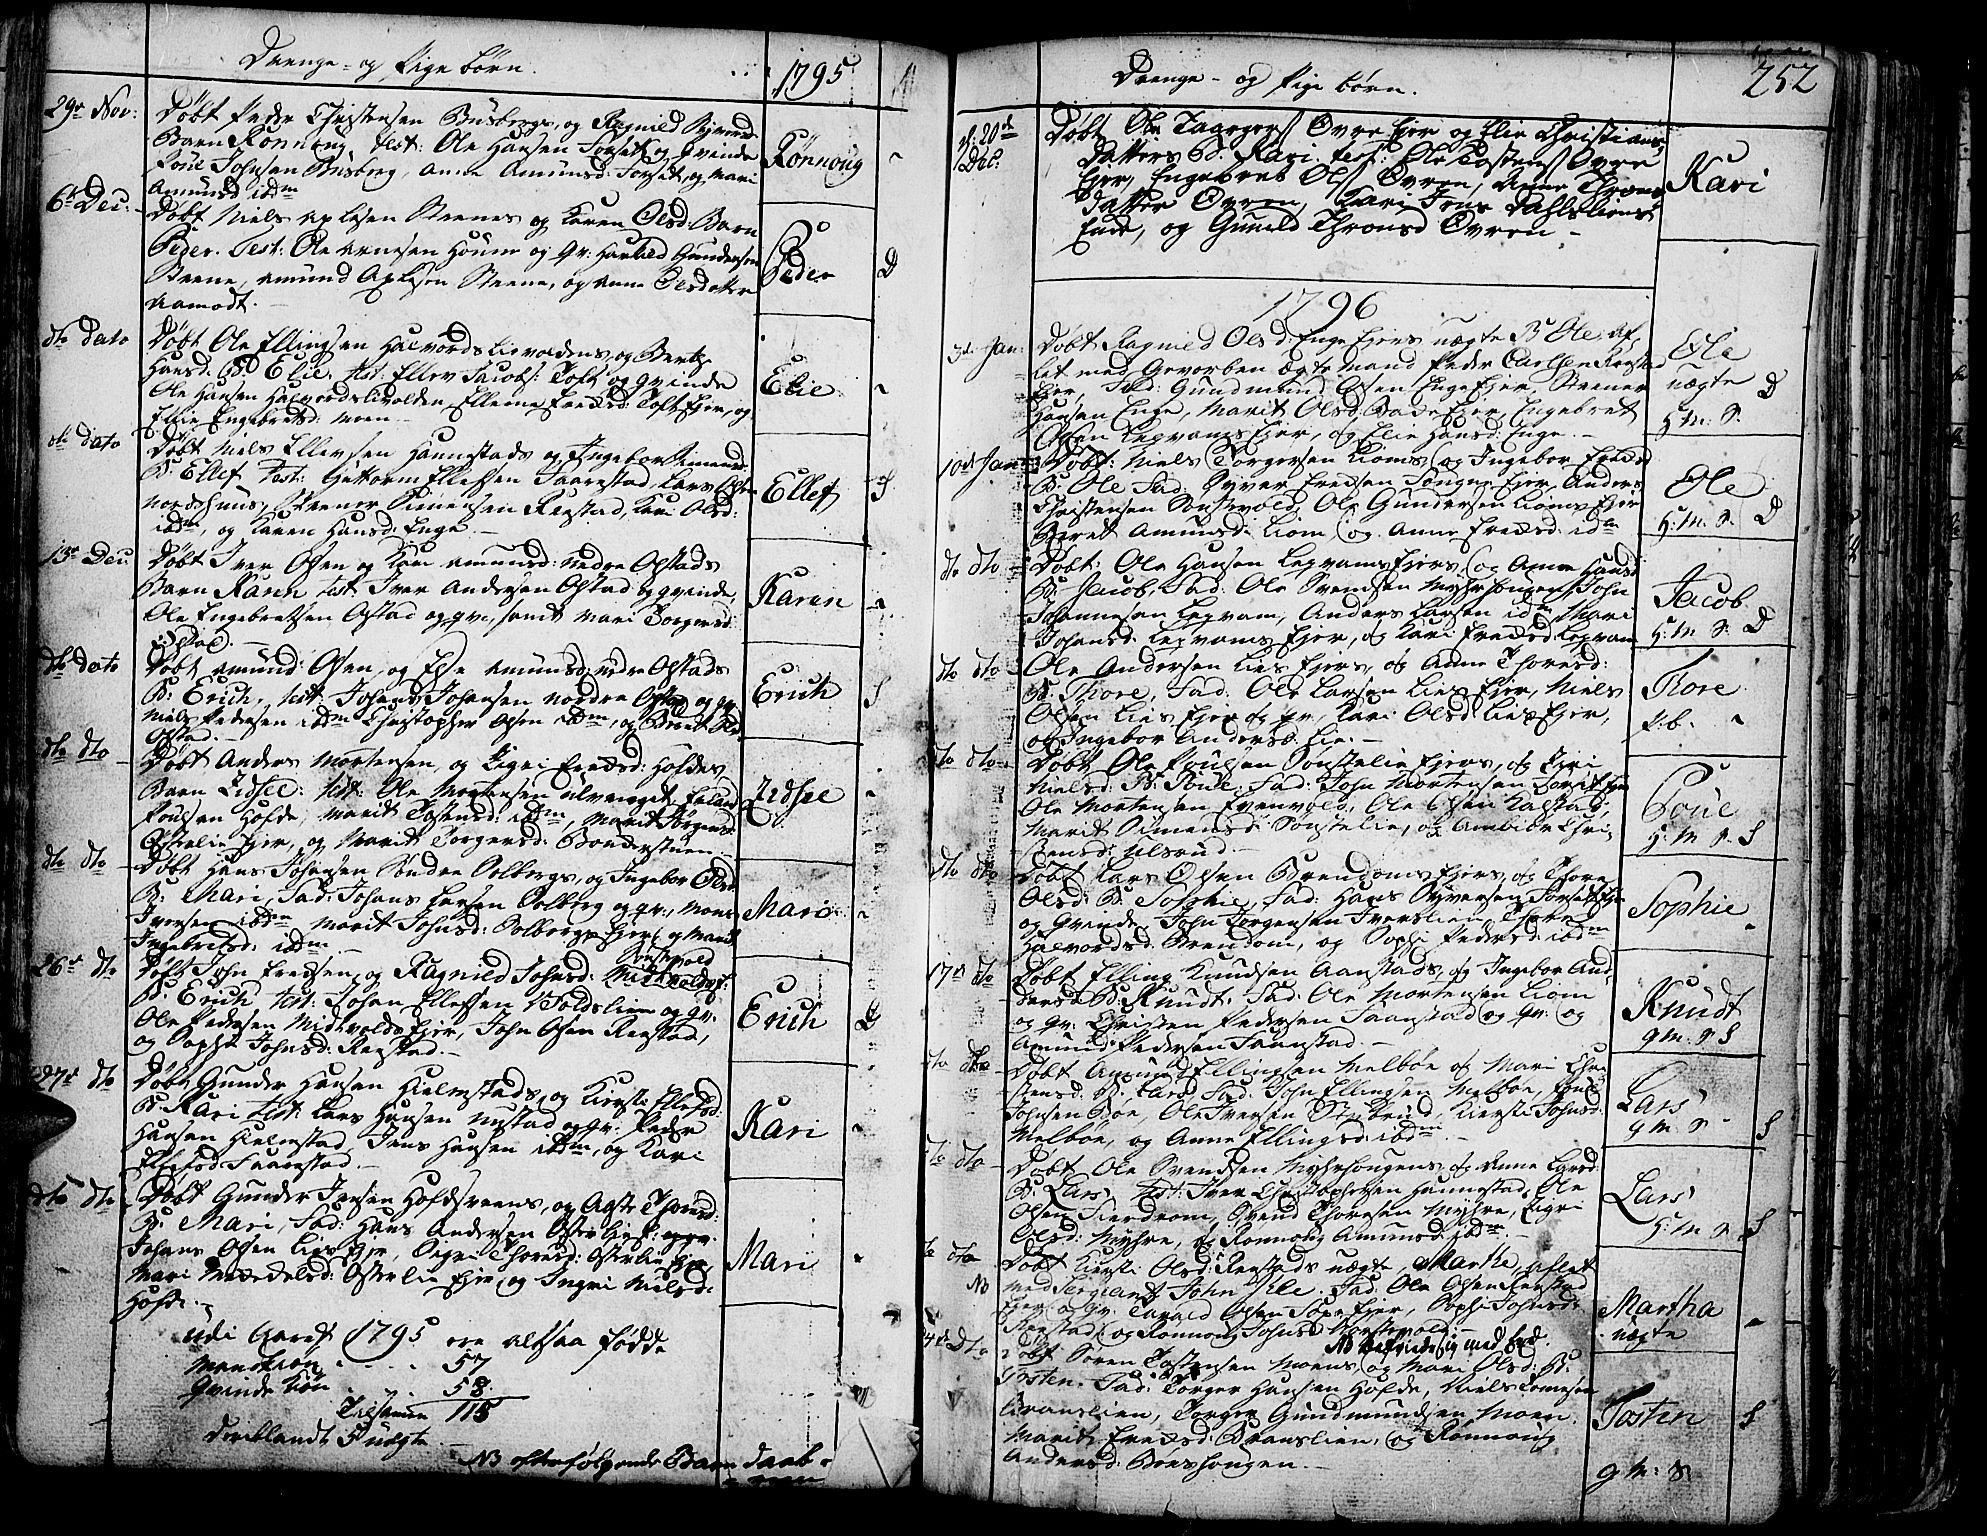 SAH, Gausdal prestekontor, Ministerialbok nr. 3, 1758-1809, s. 252